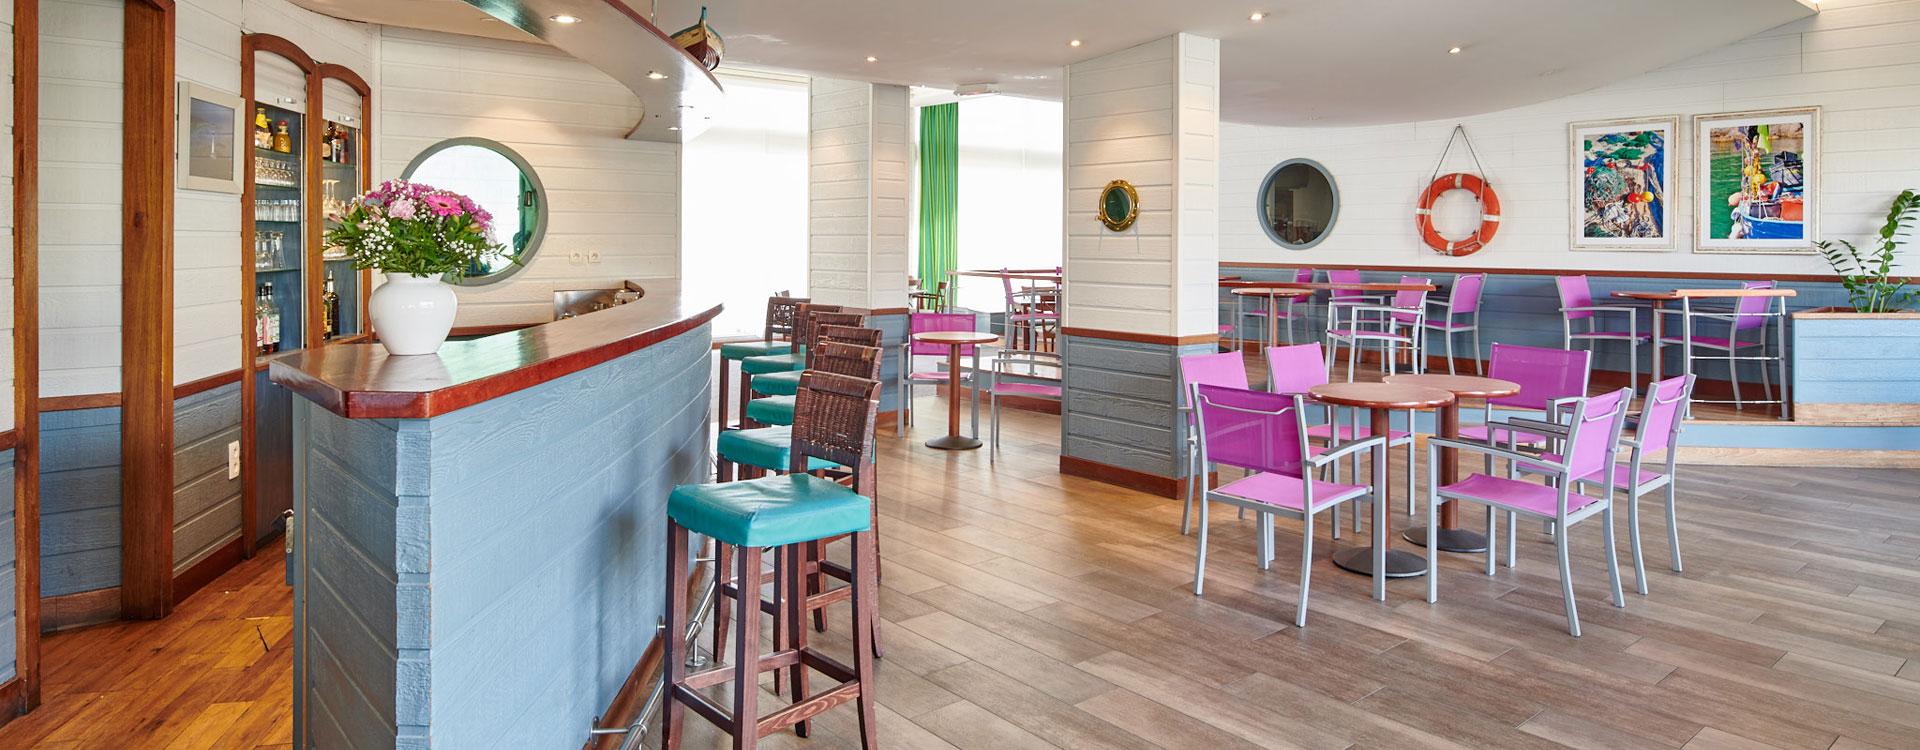 bar appart hotel biarritz